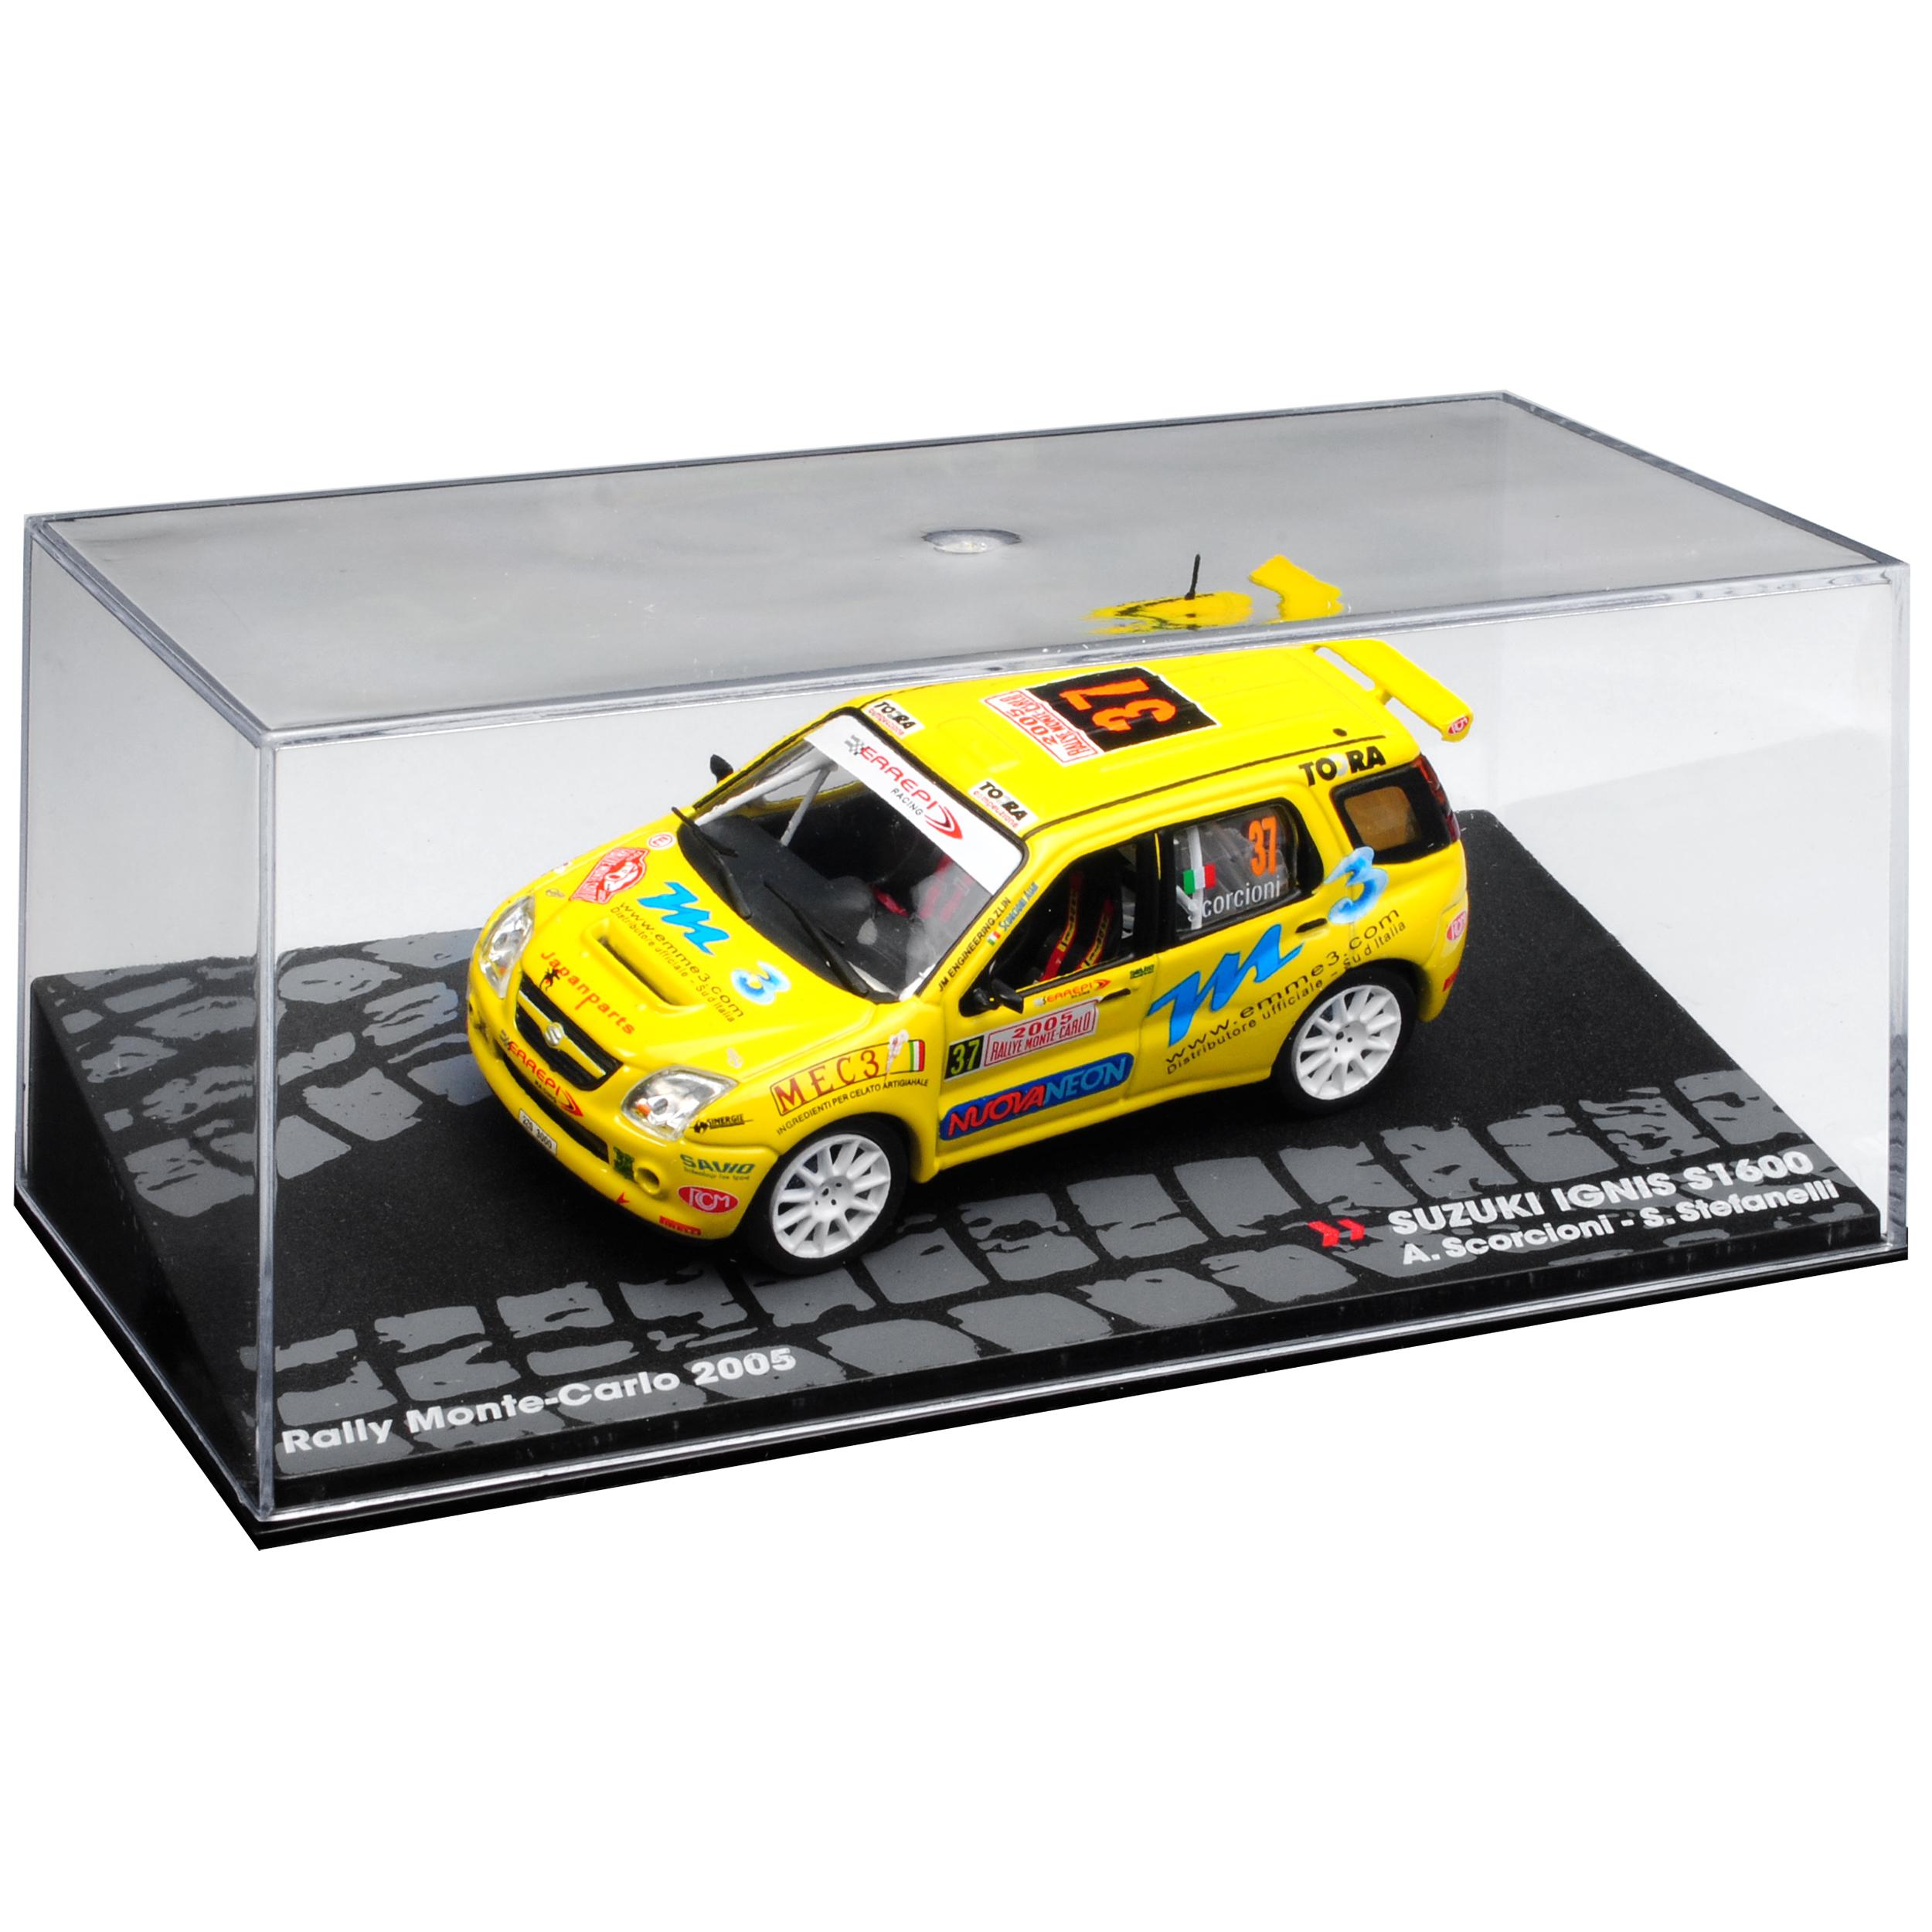 75032 Brick Ø16 W Cross LEGO RICAMBIO ORIGINALE CODICE 4211526